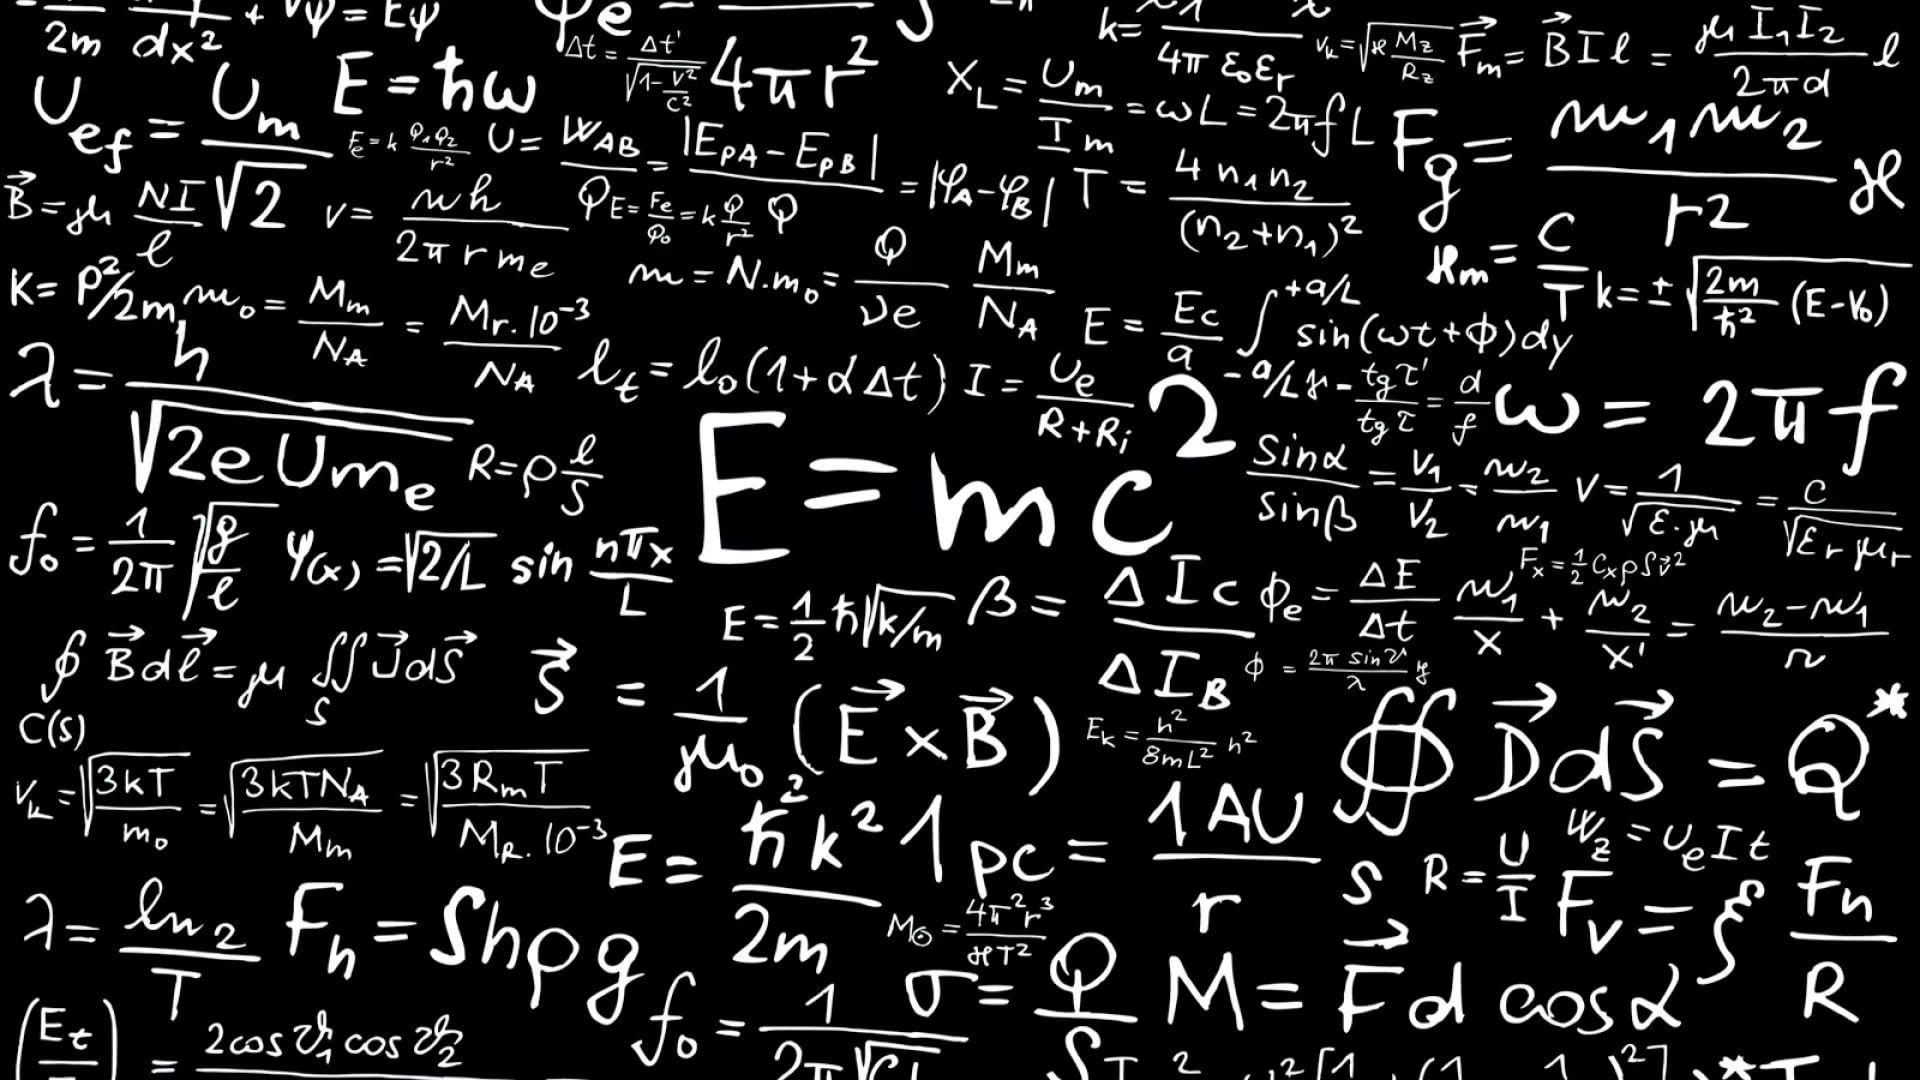 Math Equation full screen hd wallpaper